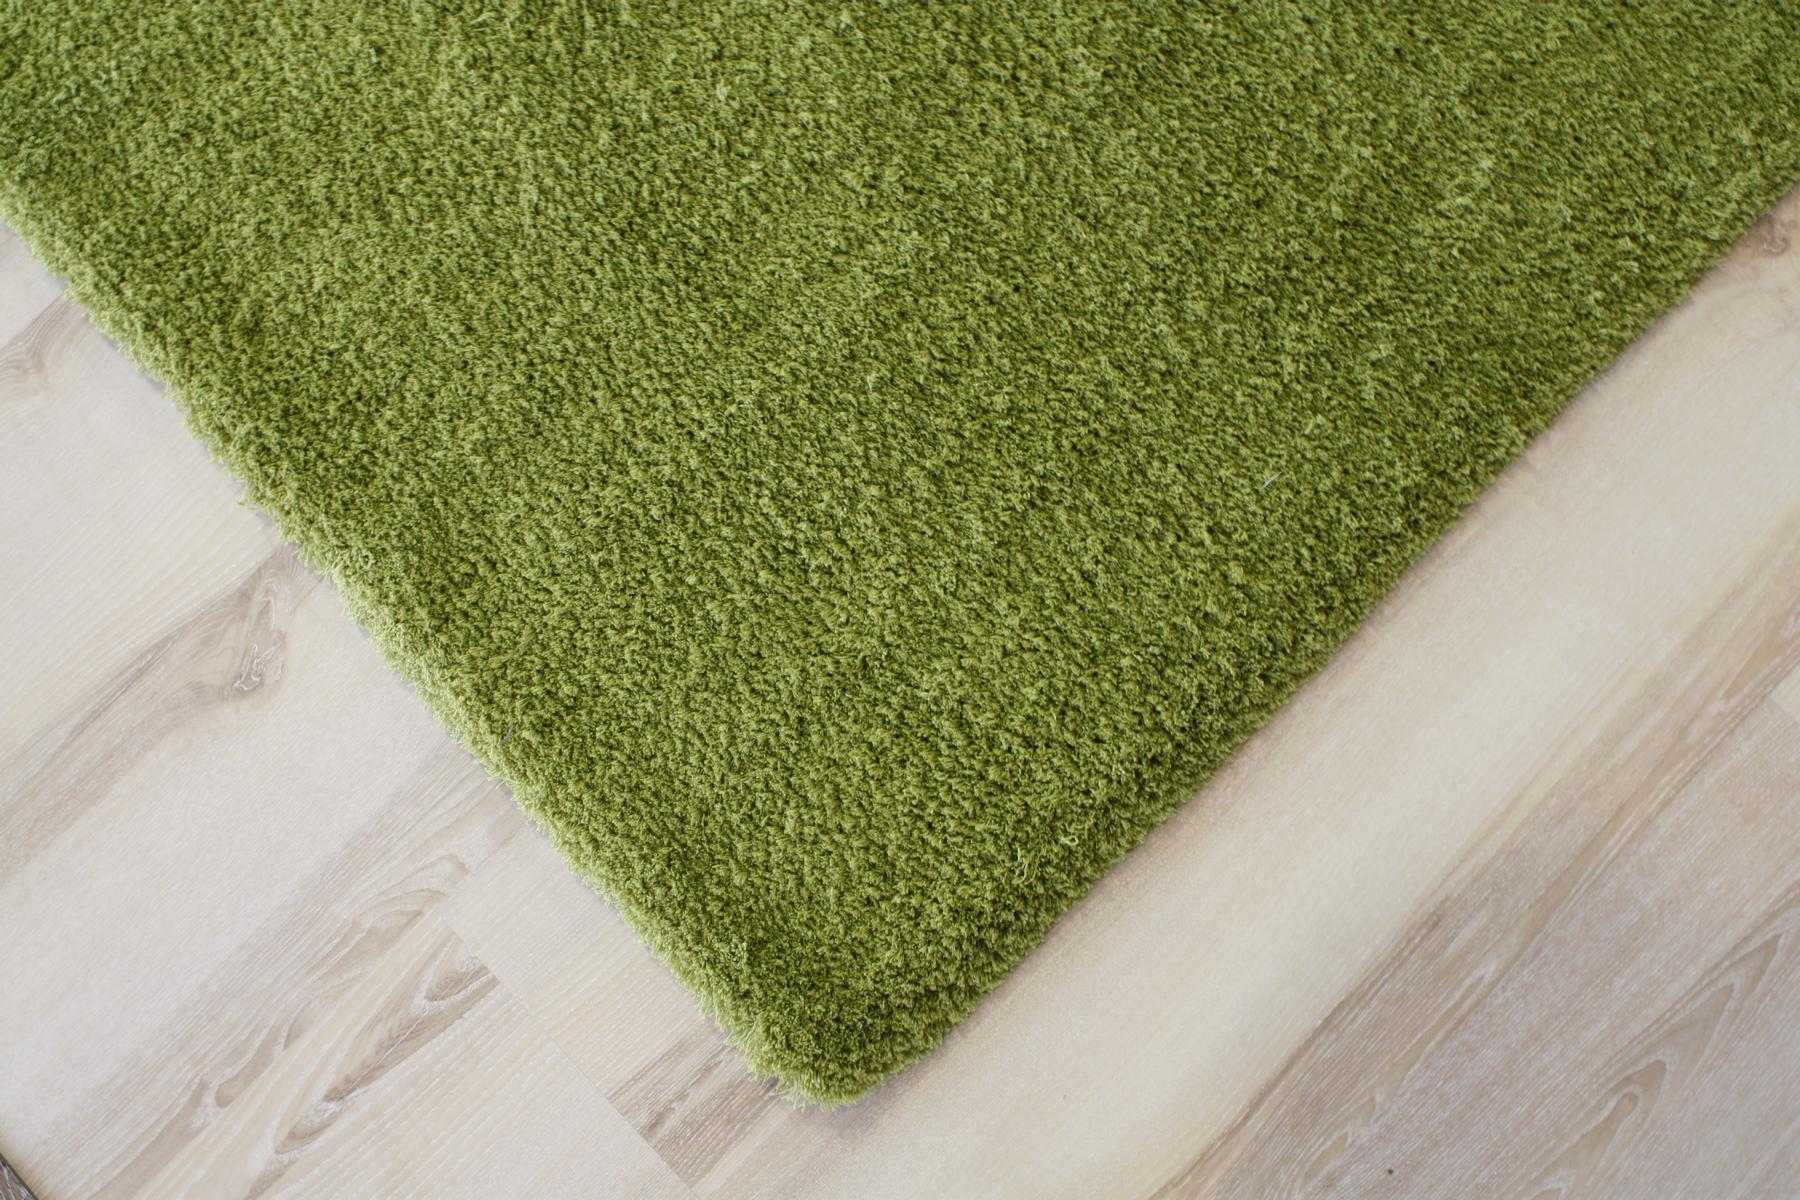 Teppich Langflor Soft Shaggy 650 grün 160×230 cm weich  eBay